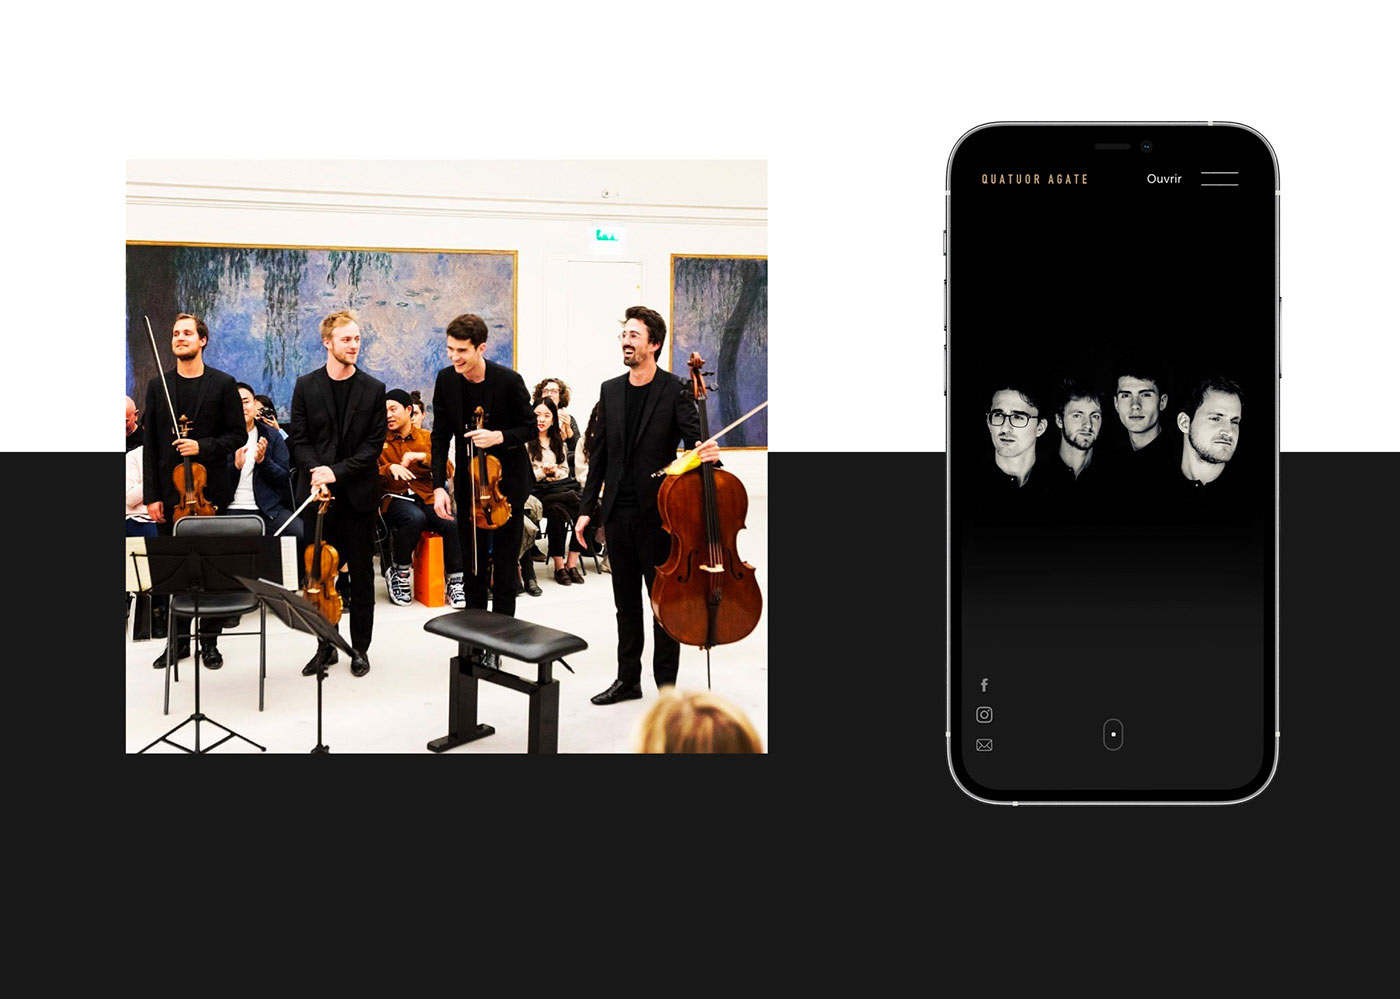 quatuor agate french string quartet quatuor à cordes webdesign website